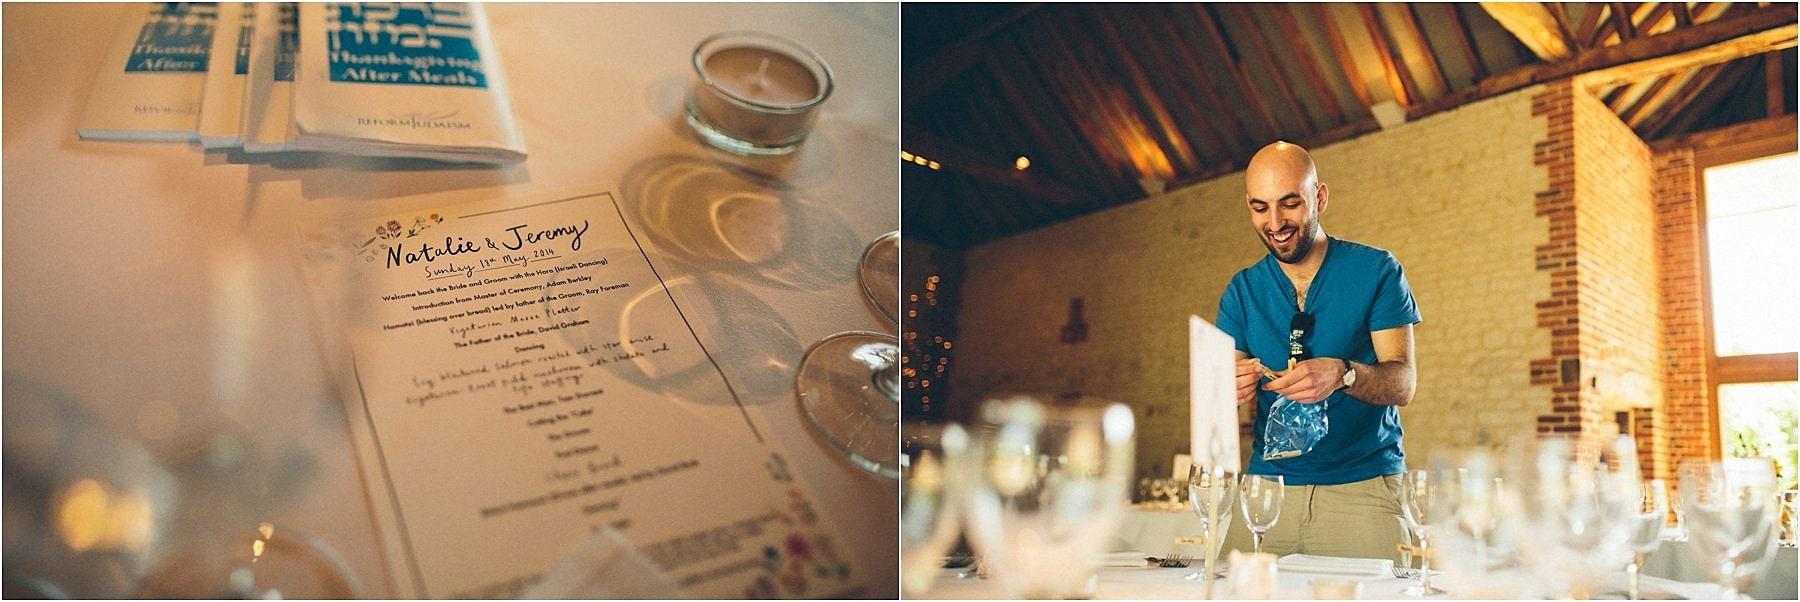 The_Barn_At_Bury_Court_Wedding_010